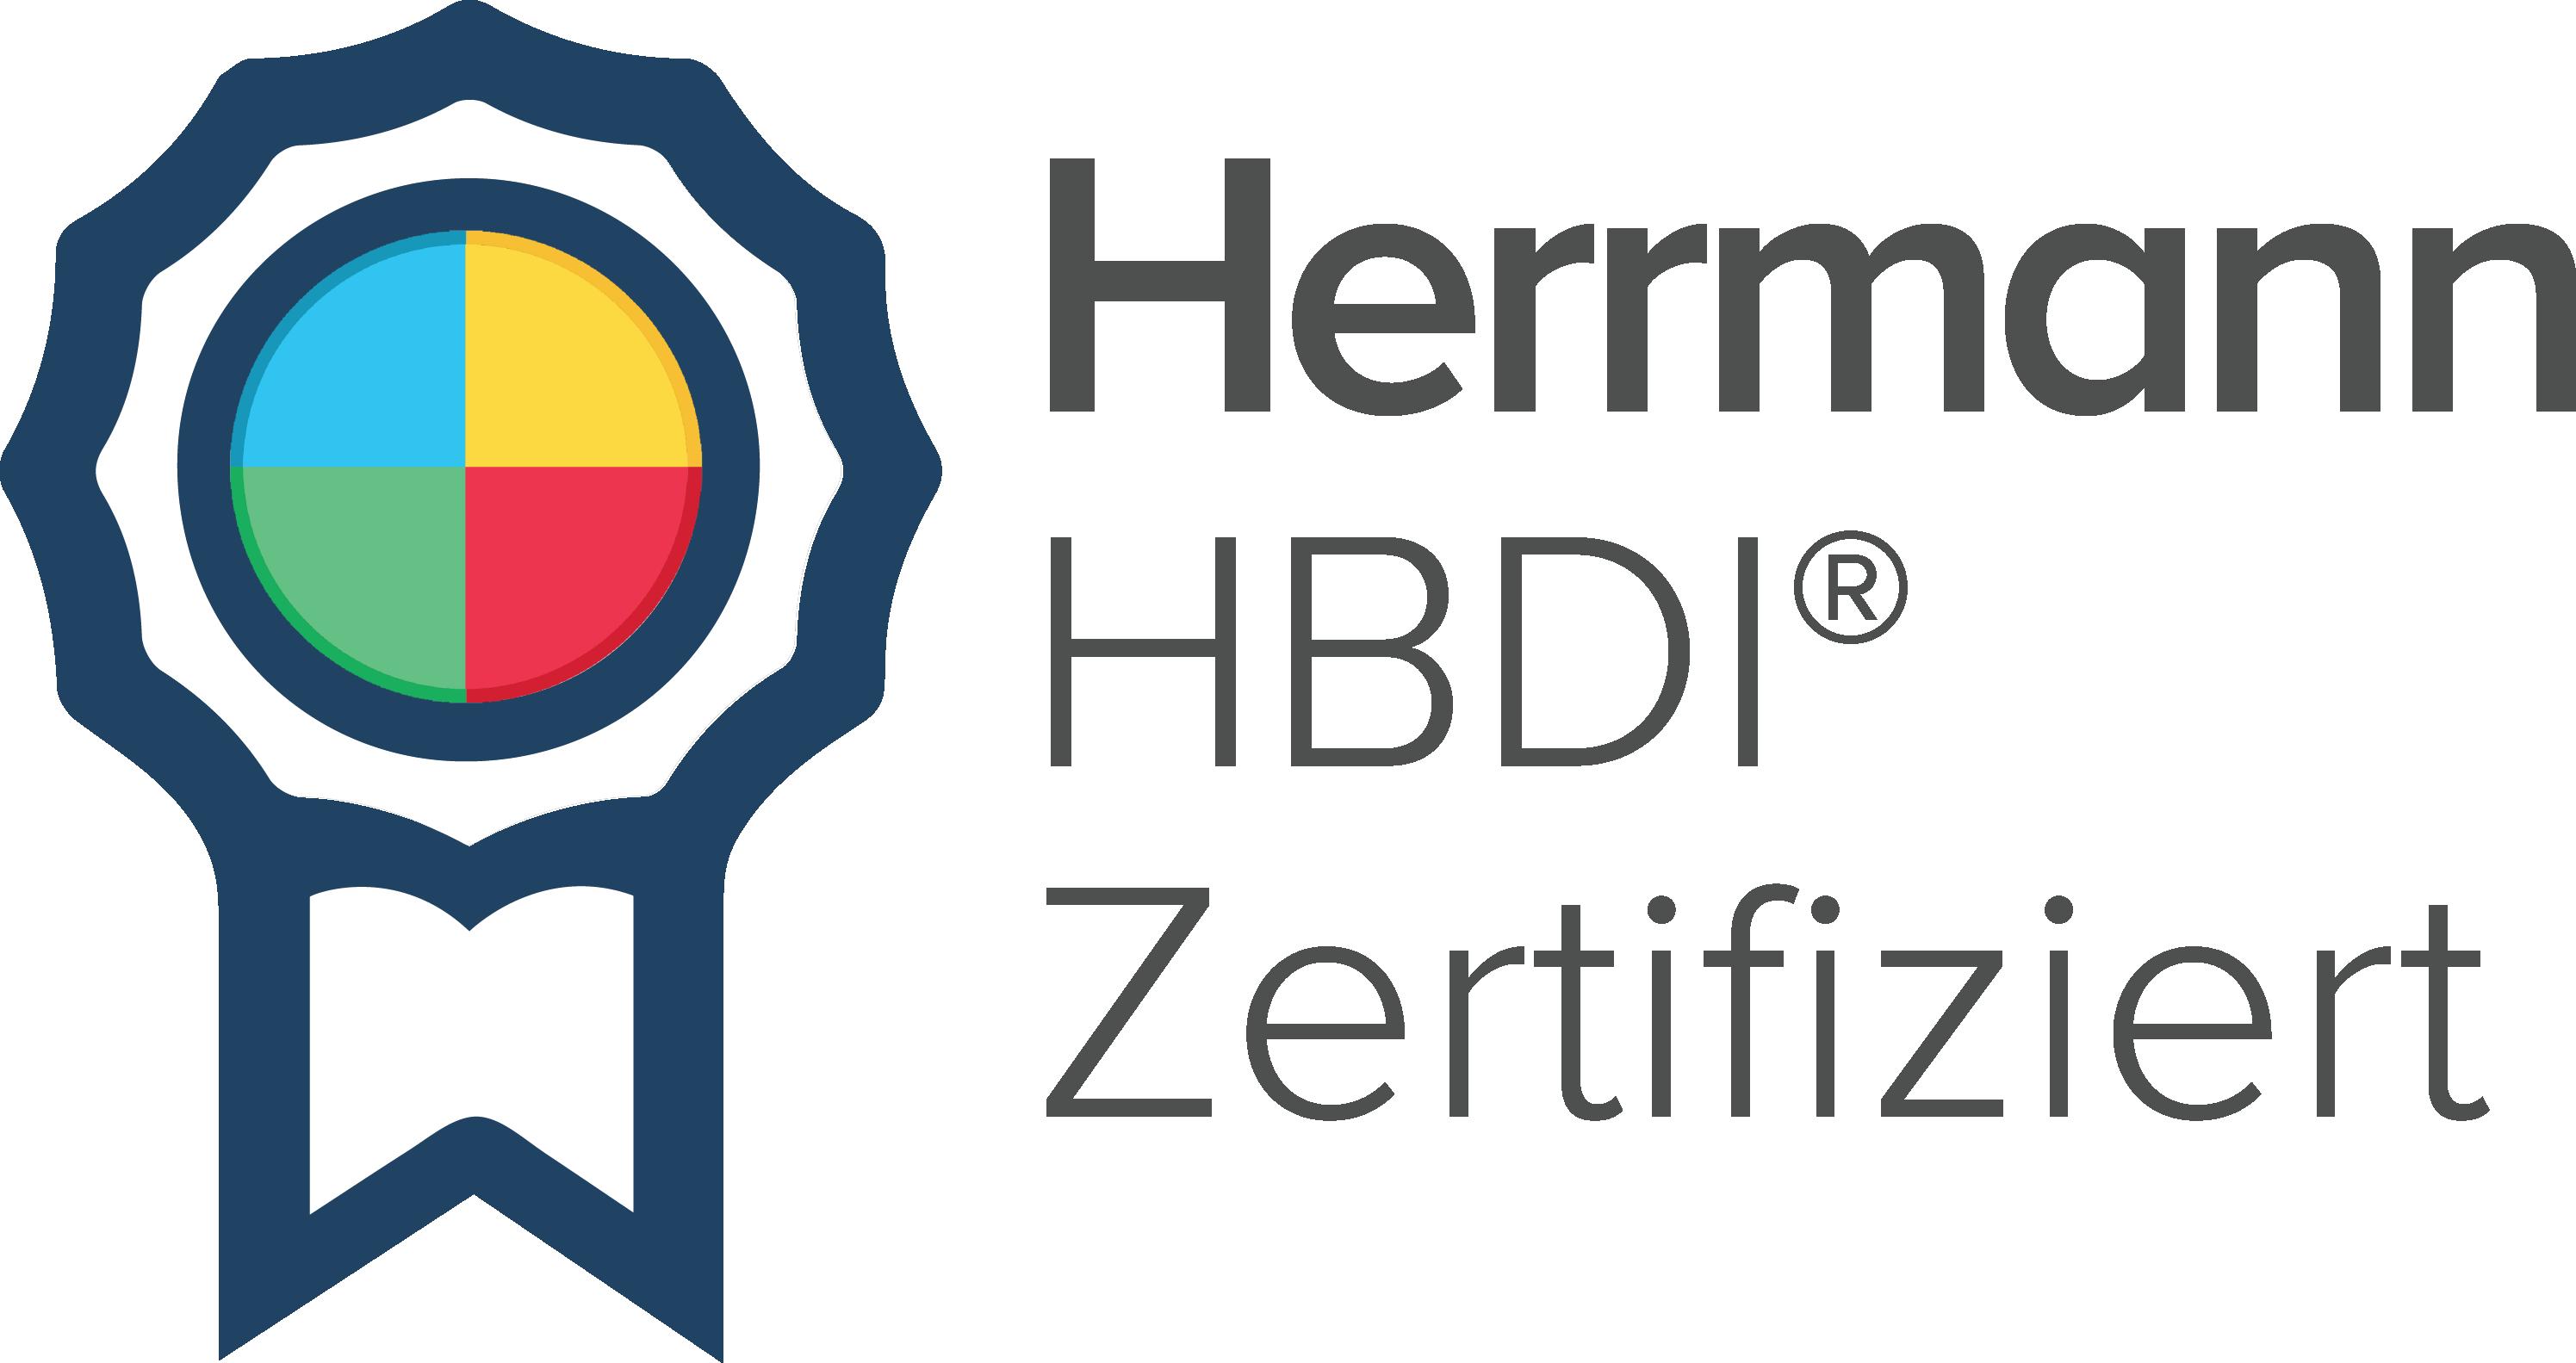 HBDI-Zertifiziert